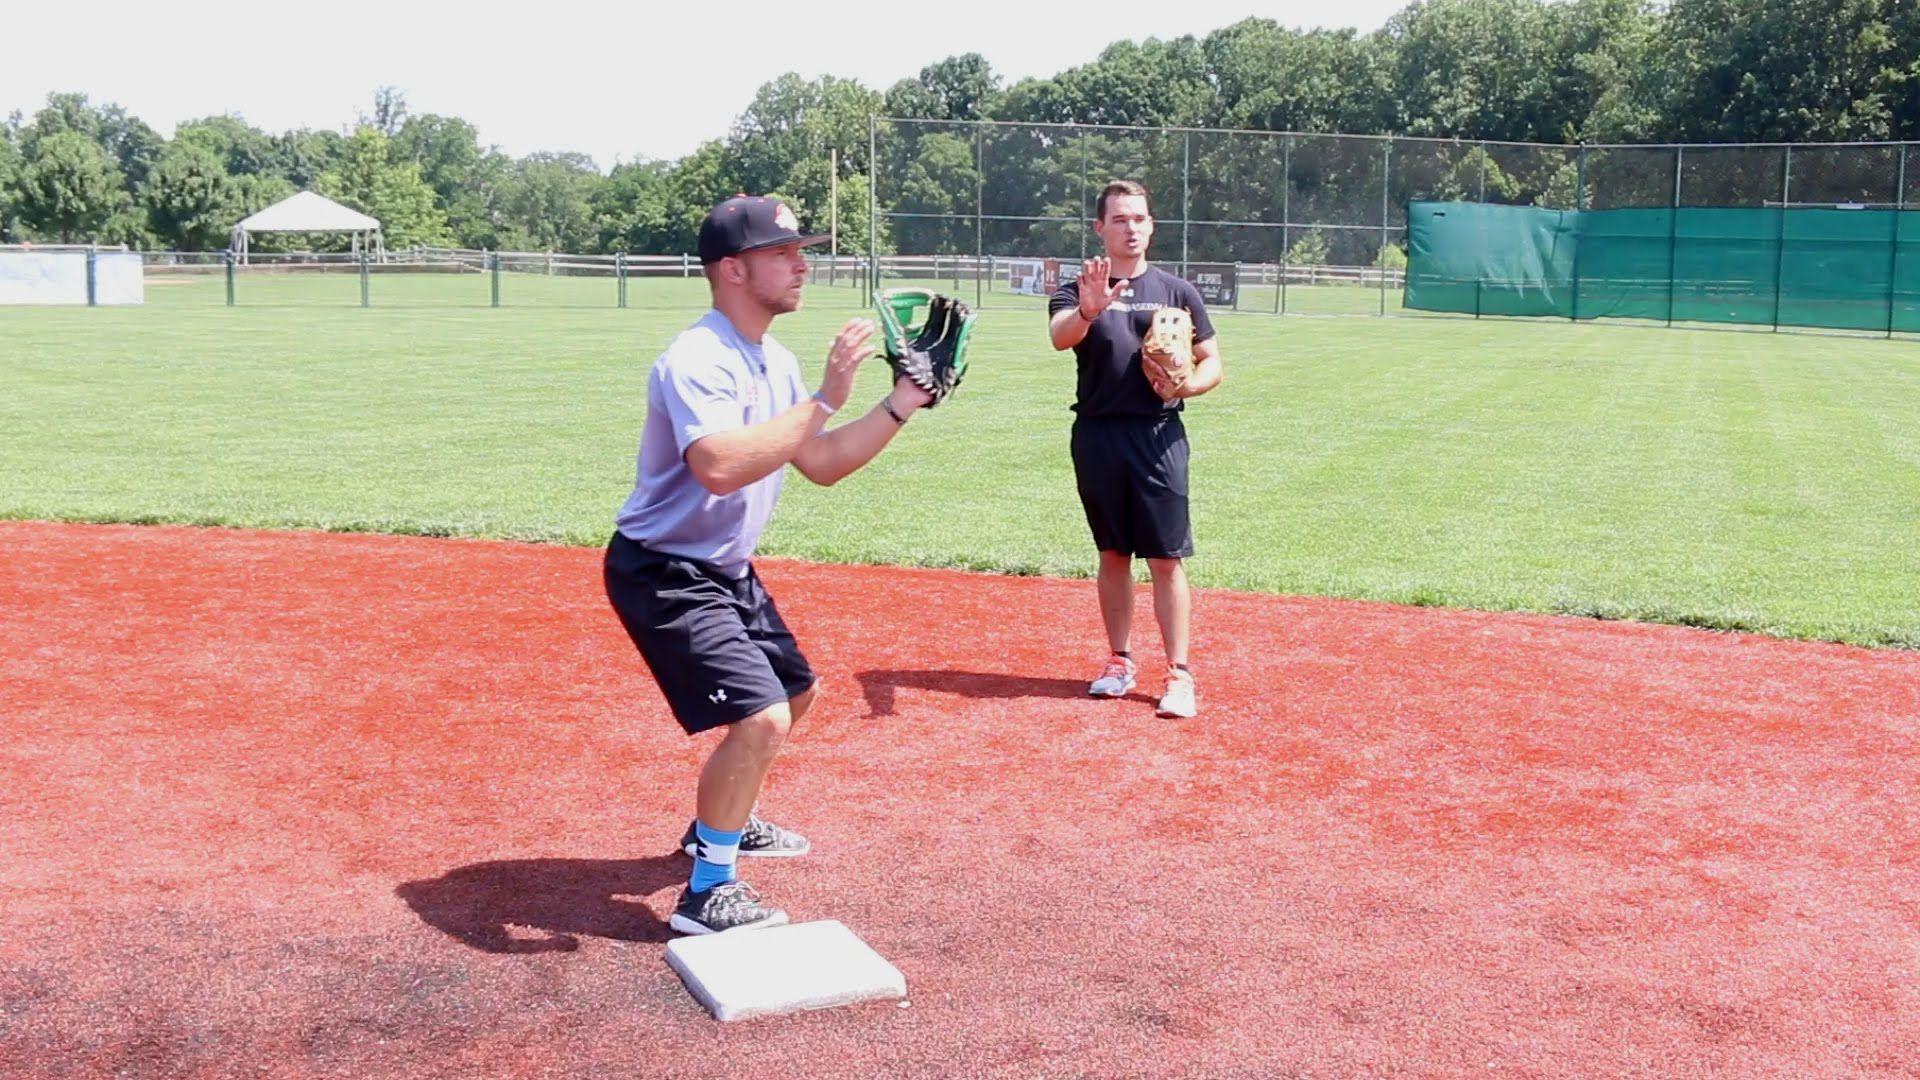 Shortstop Double Play Footwork the Ripken Way - YouTube